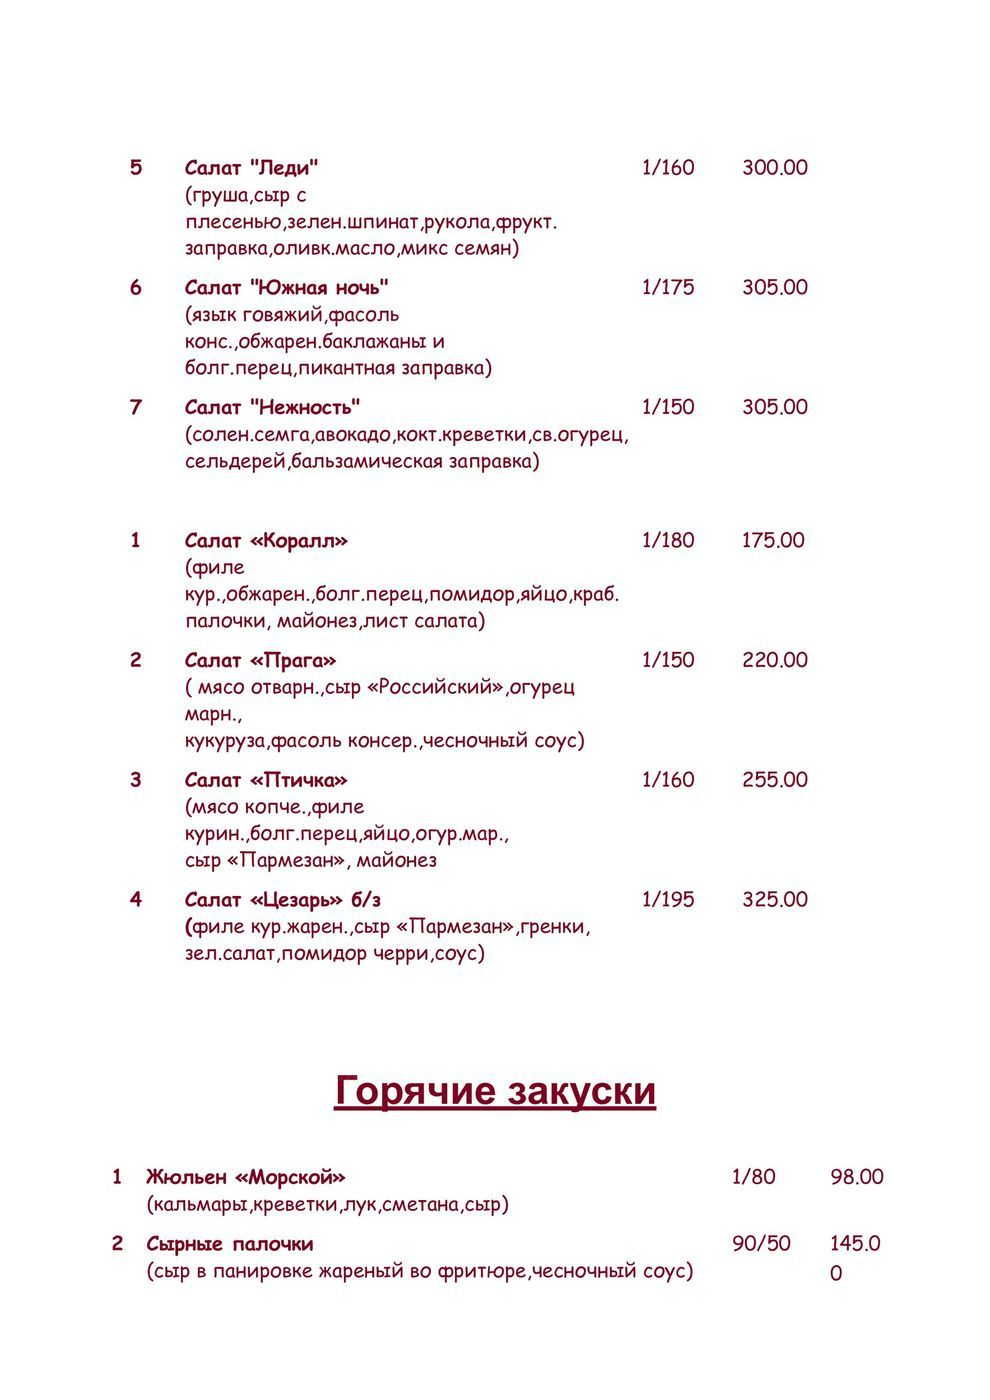 Меню кафе Мельба на улице Кирова фото 3